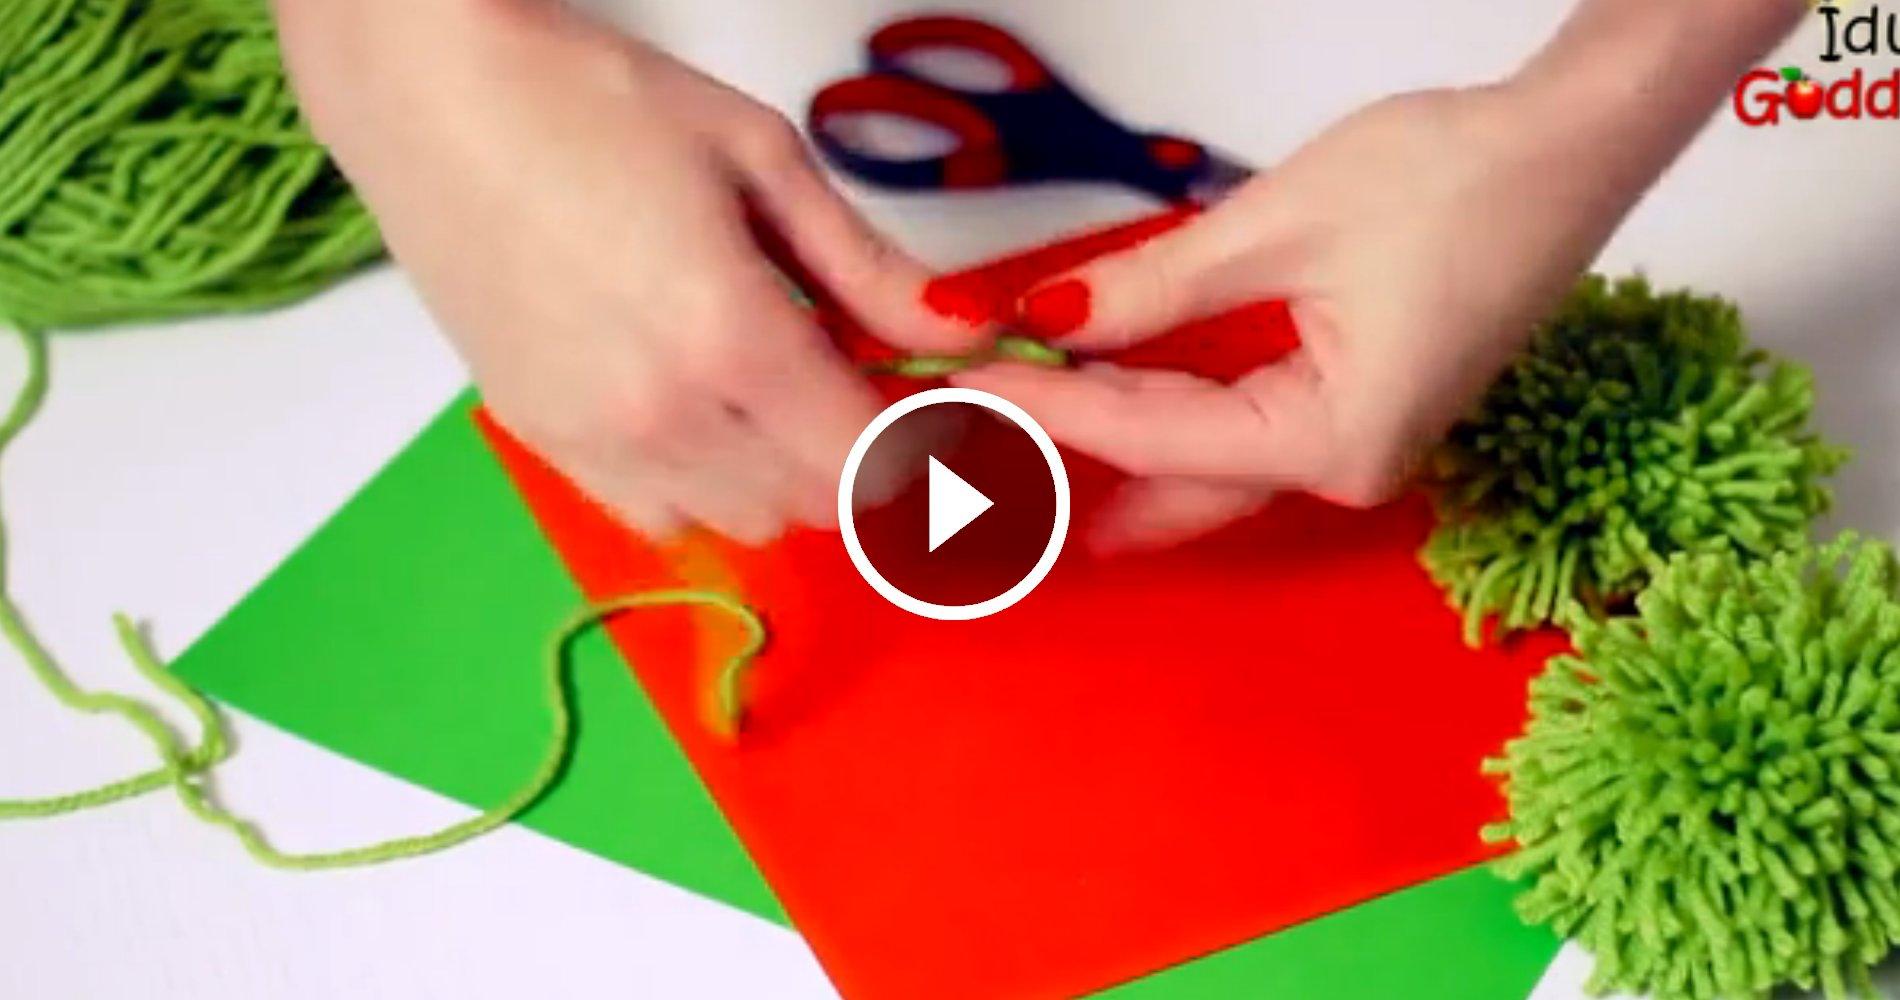 Giochi per casalinghe - 4 3